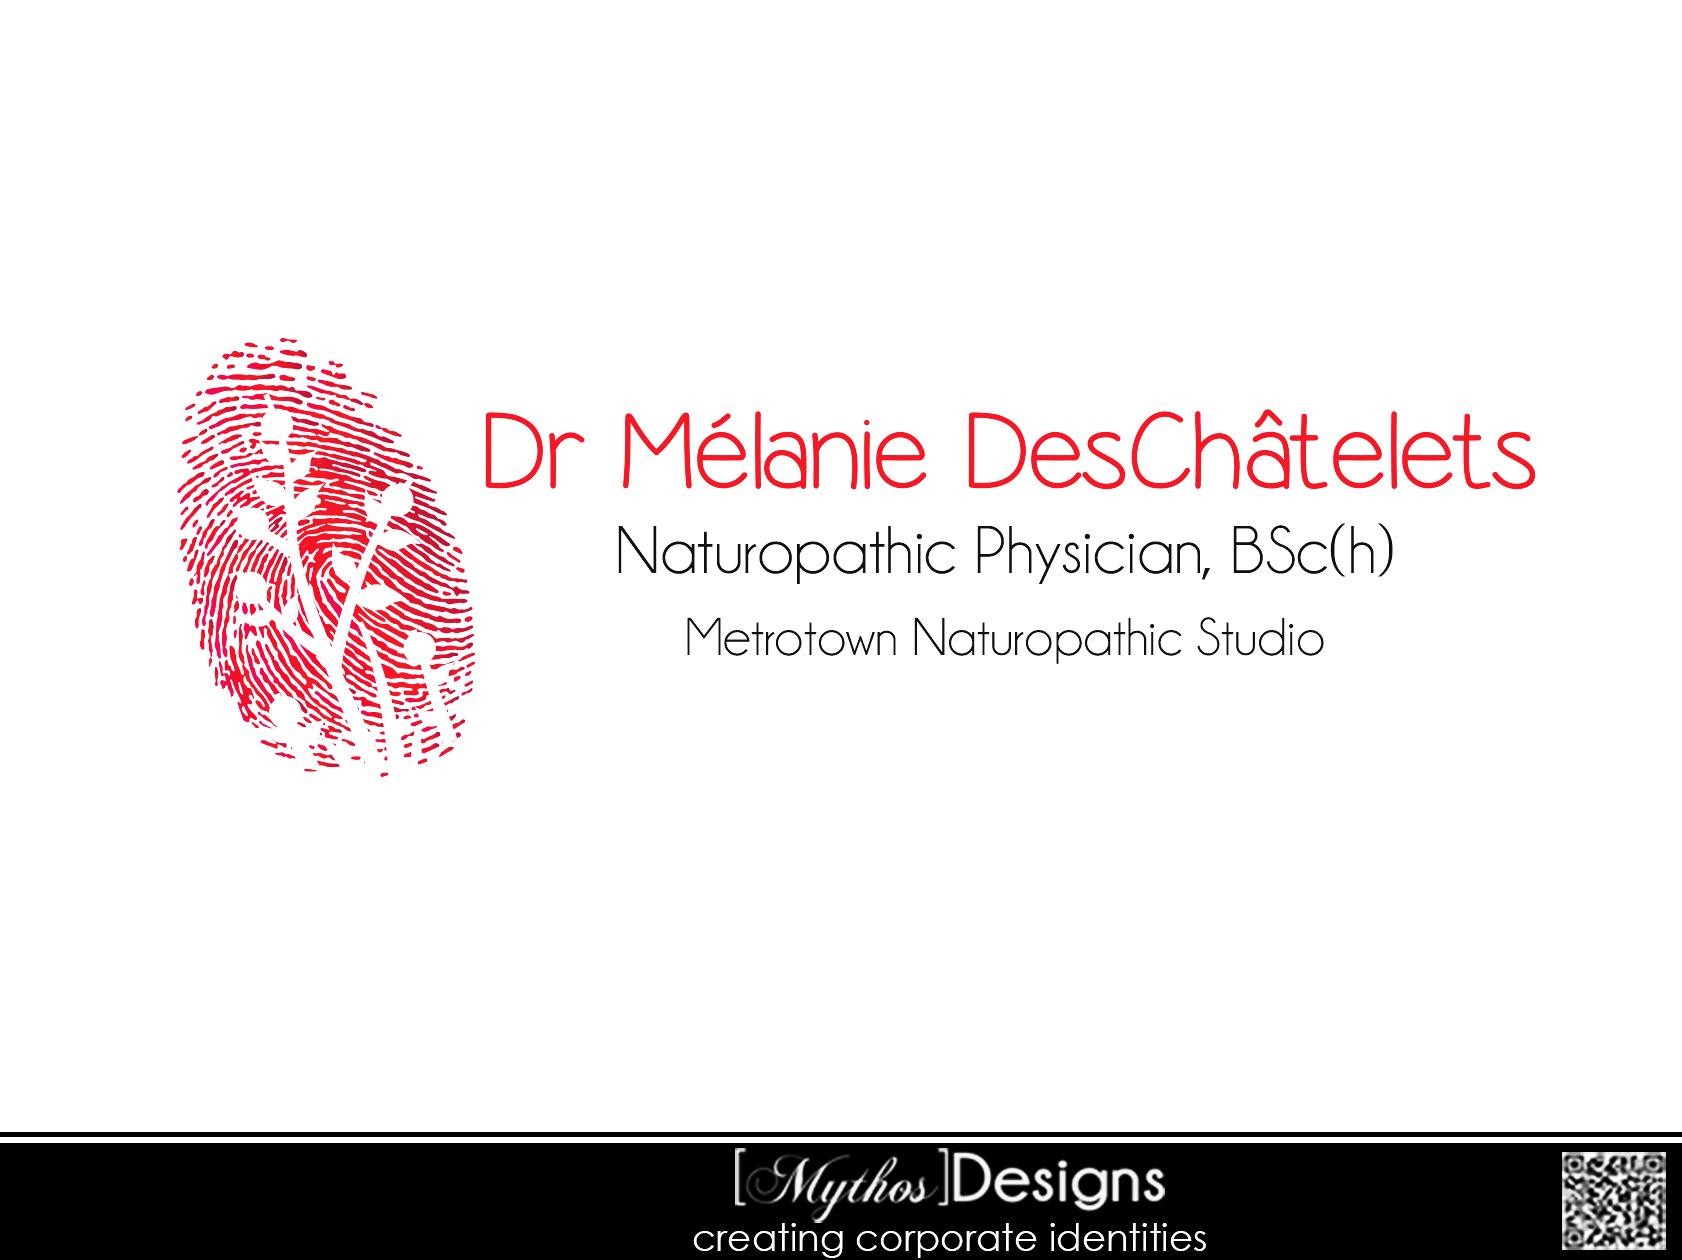 Logo Design by Mythos Designs - Entry No. 52 in the Logo Design Contest Artistic Logo Design for Dr Mélanie DesChâtelets.